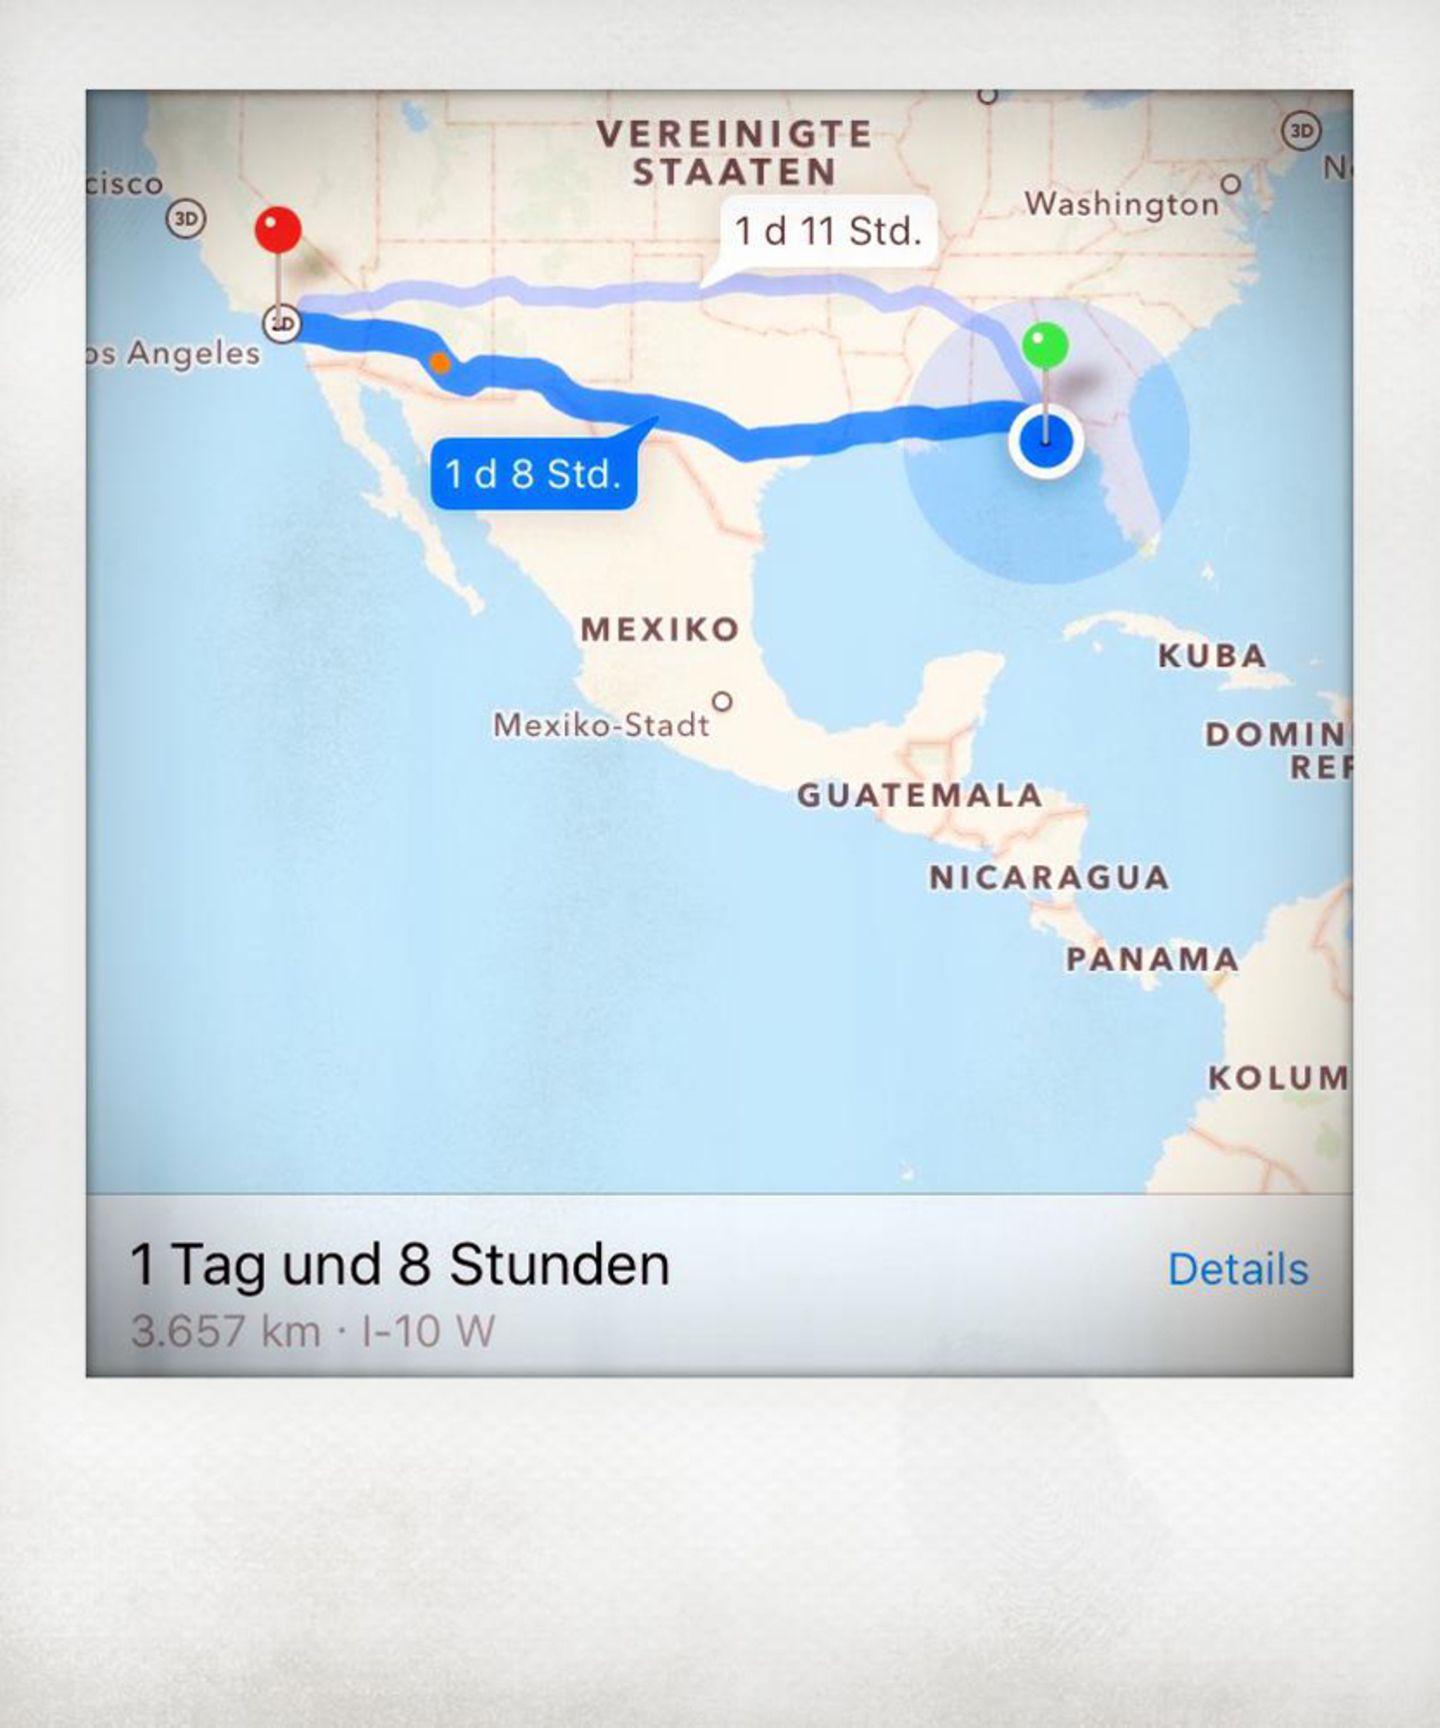 Screenshot, Google Maps, Vereinigte Staaten